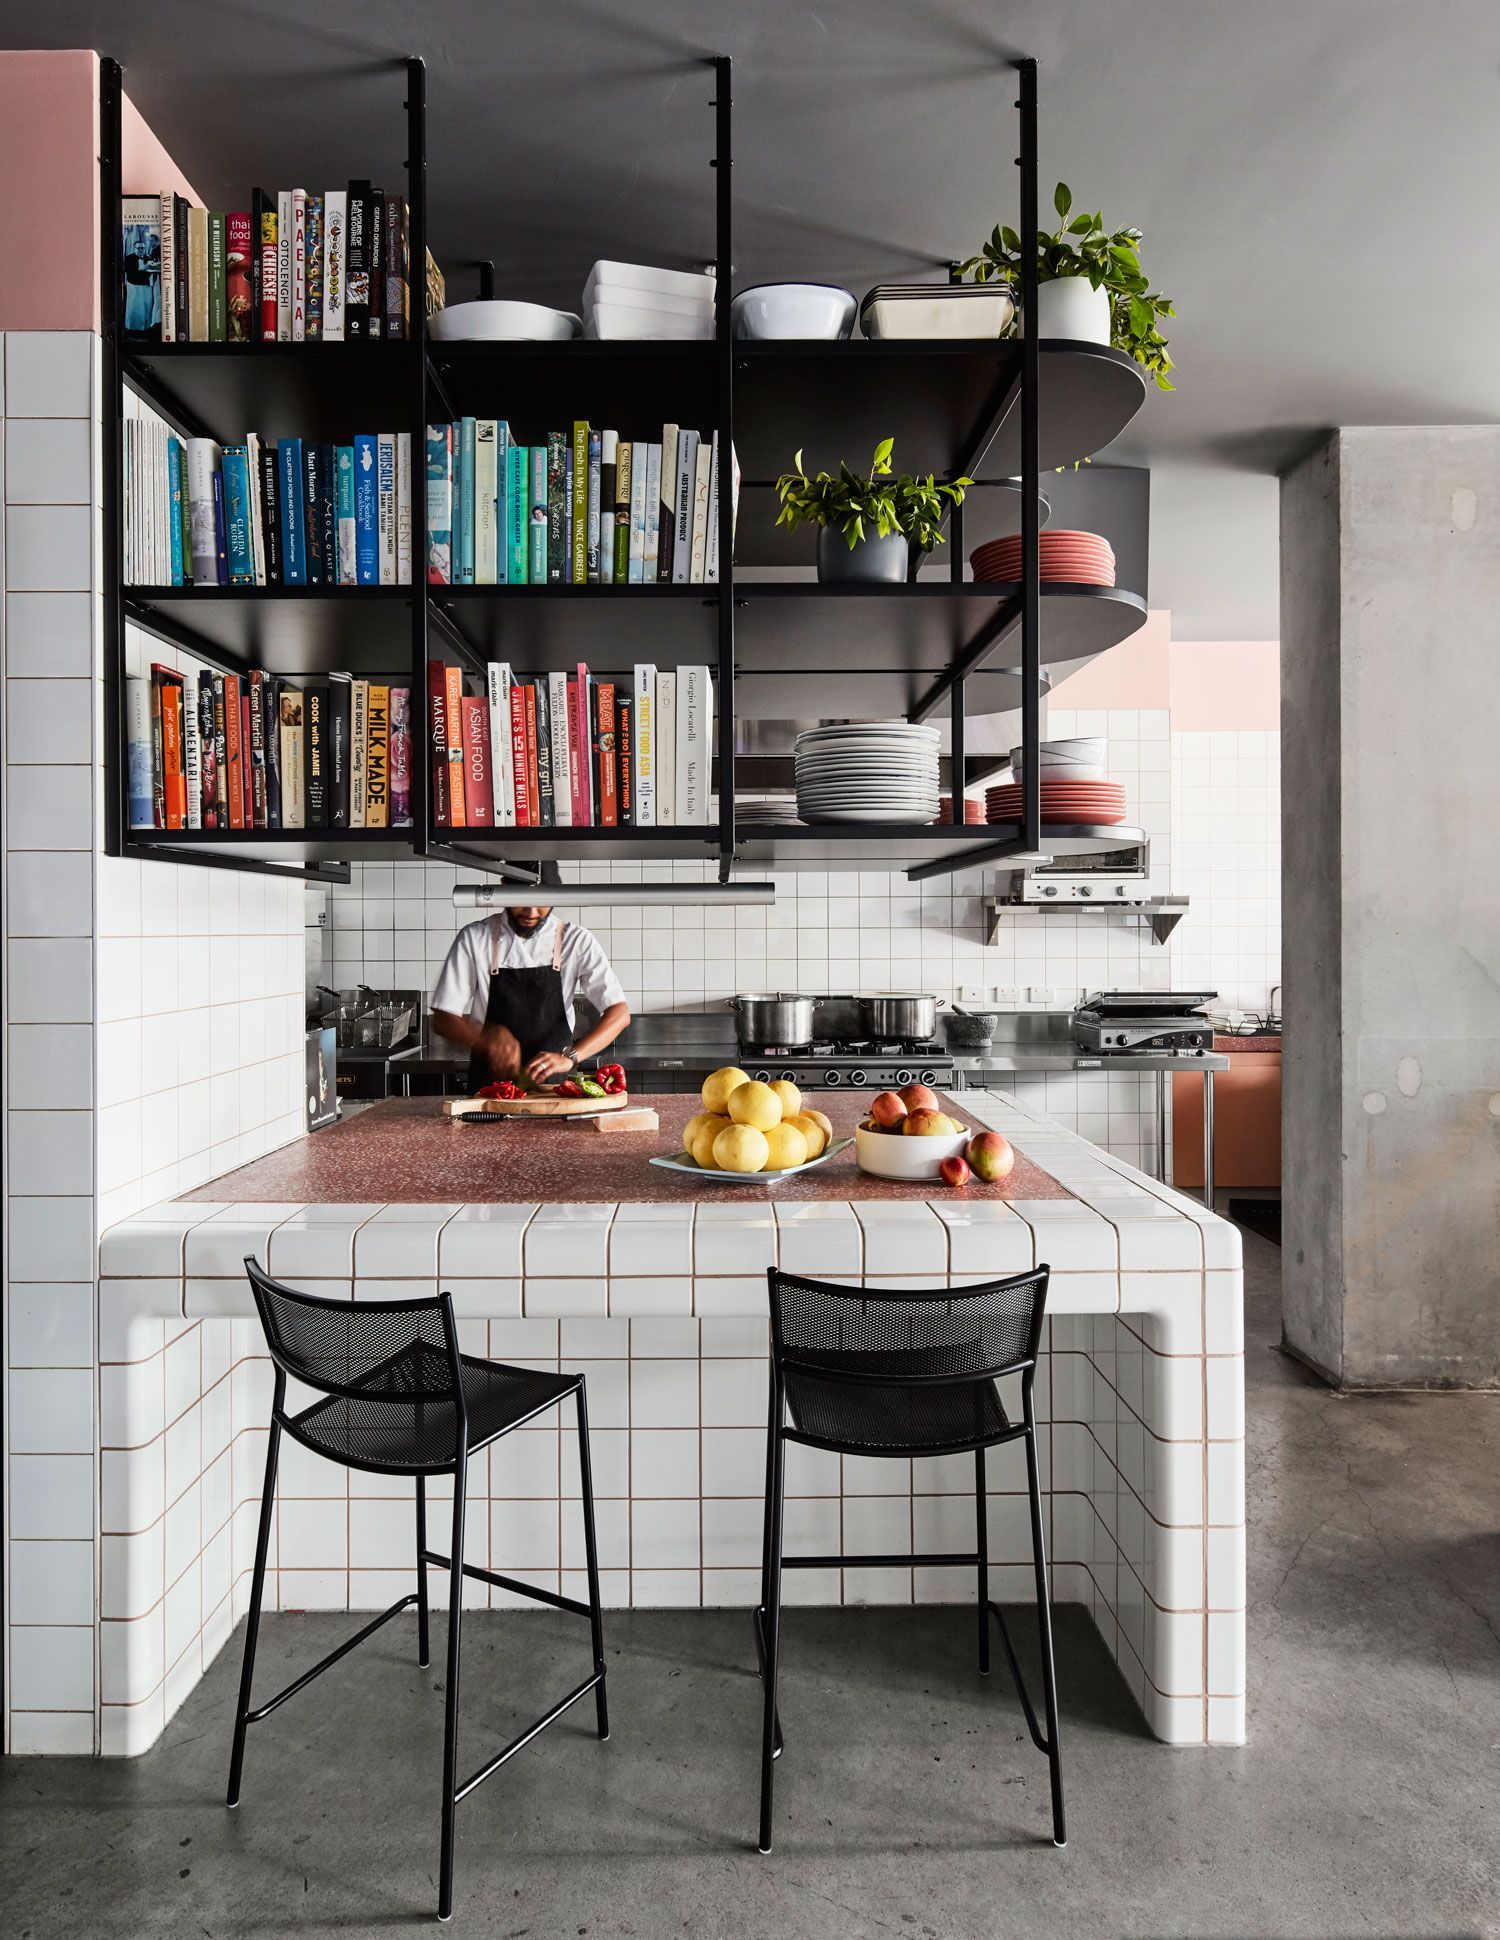 Hunter & Co Deli In Elsternwick, Melbourne By Mim Design